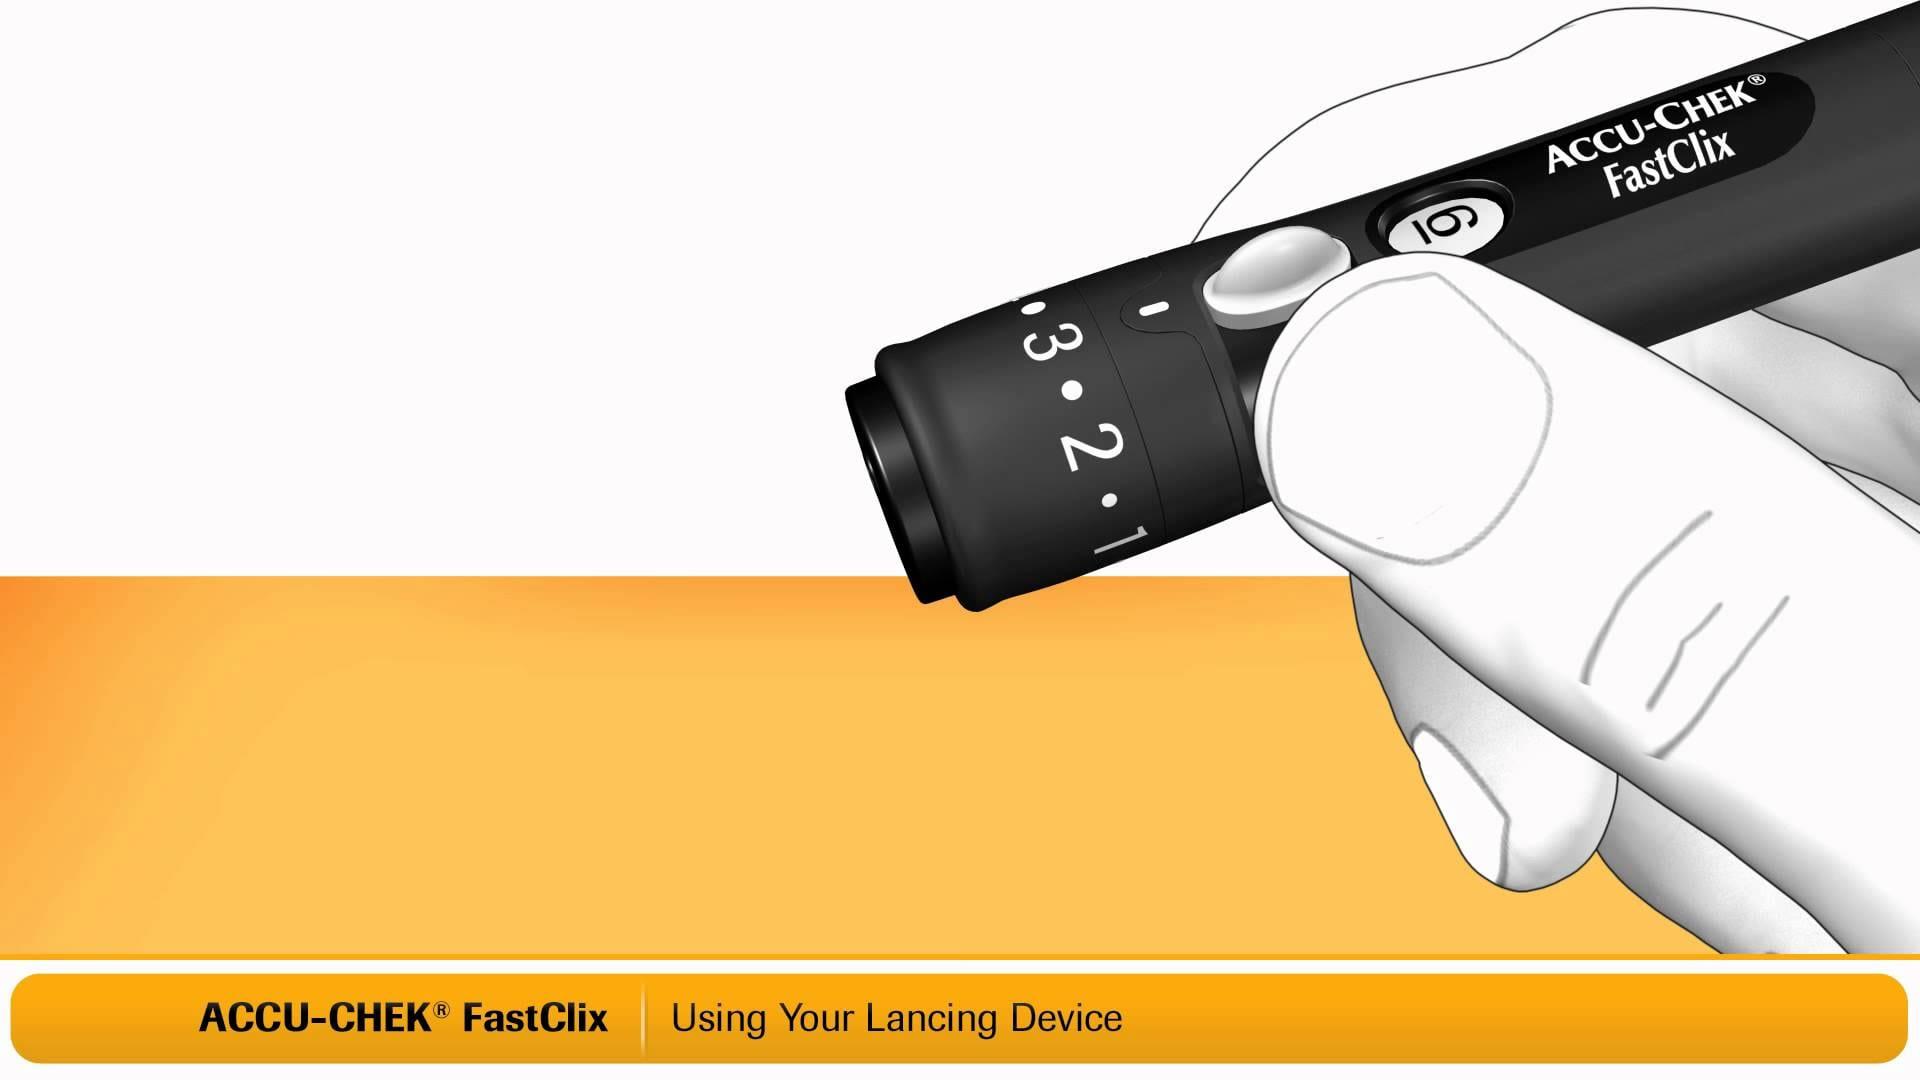 Fastclix Accu-Check Fastclix Lancing Device Kit